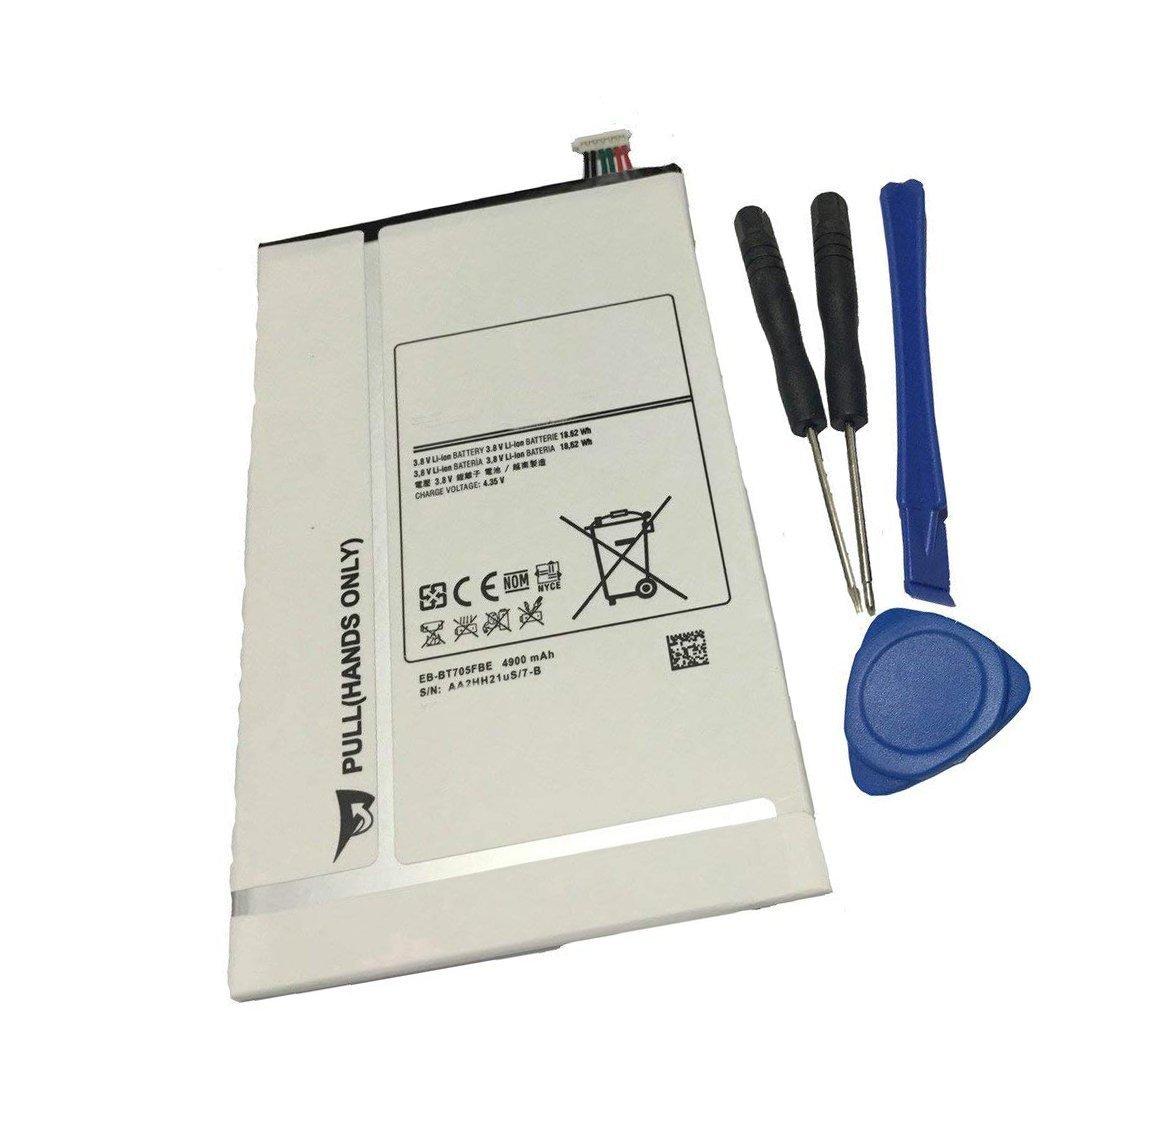 Tesurty Replacement Battery Samsung Galaxy Tab S 8.4 SM-T700, SM-T701, SM-T705, SM-T707 T700 T705 SM-T705C EB-BT705FBC EB-BT705FBE EB-BT705FBU Tablet